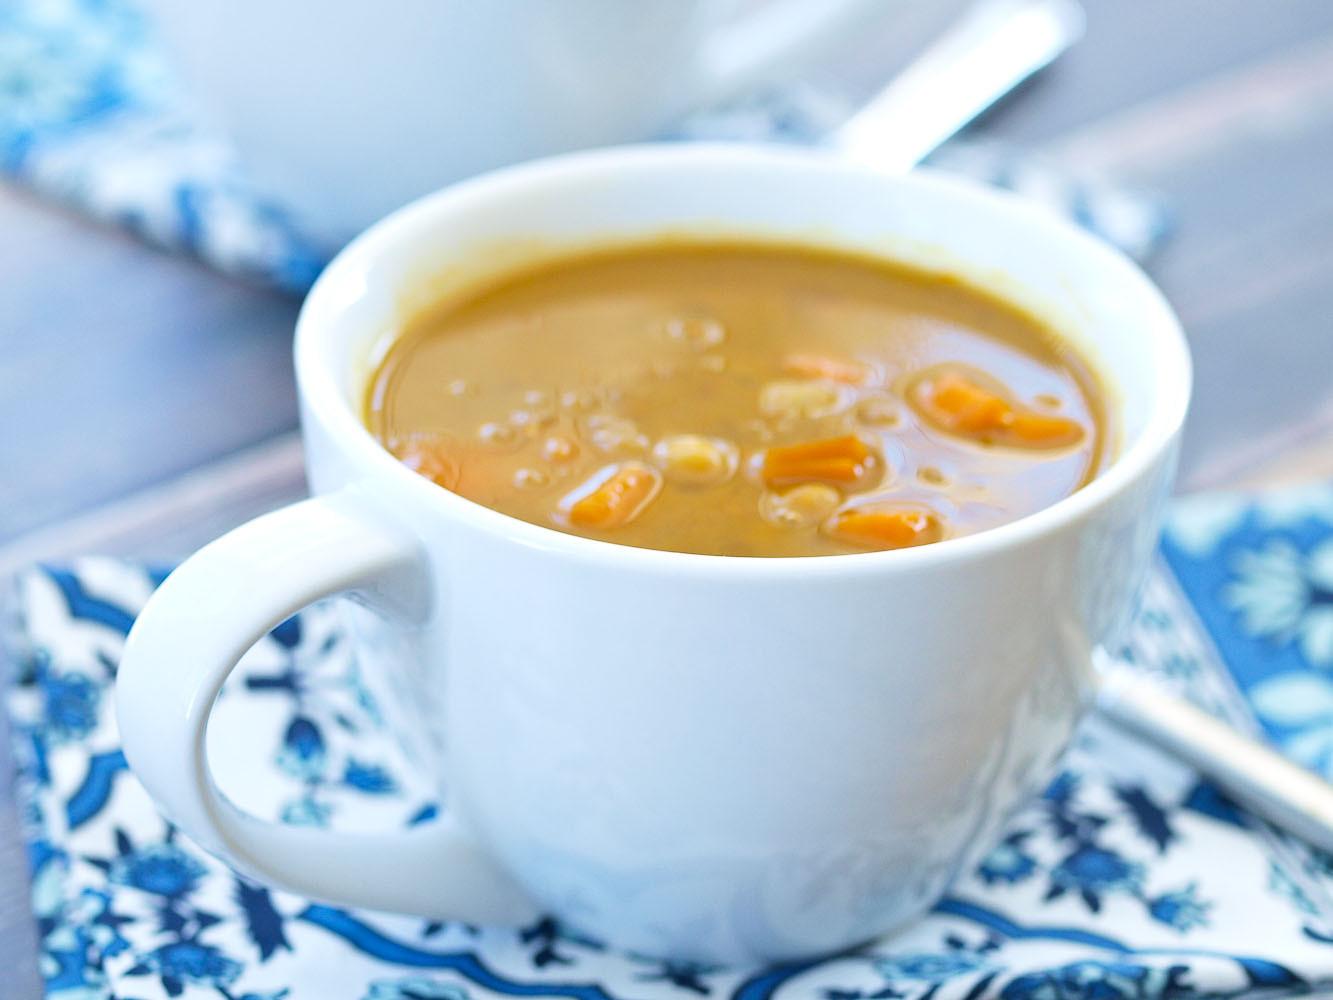 Healthy Soups To Make  Crockpot Vegan Coconut Curry Chickpea Lentil Soup Happy